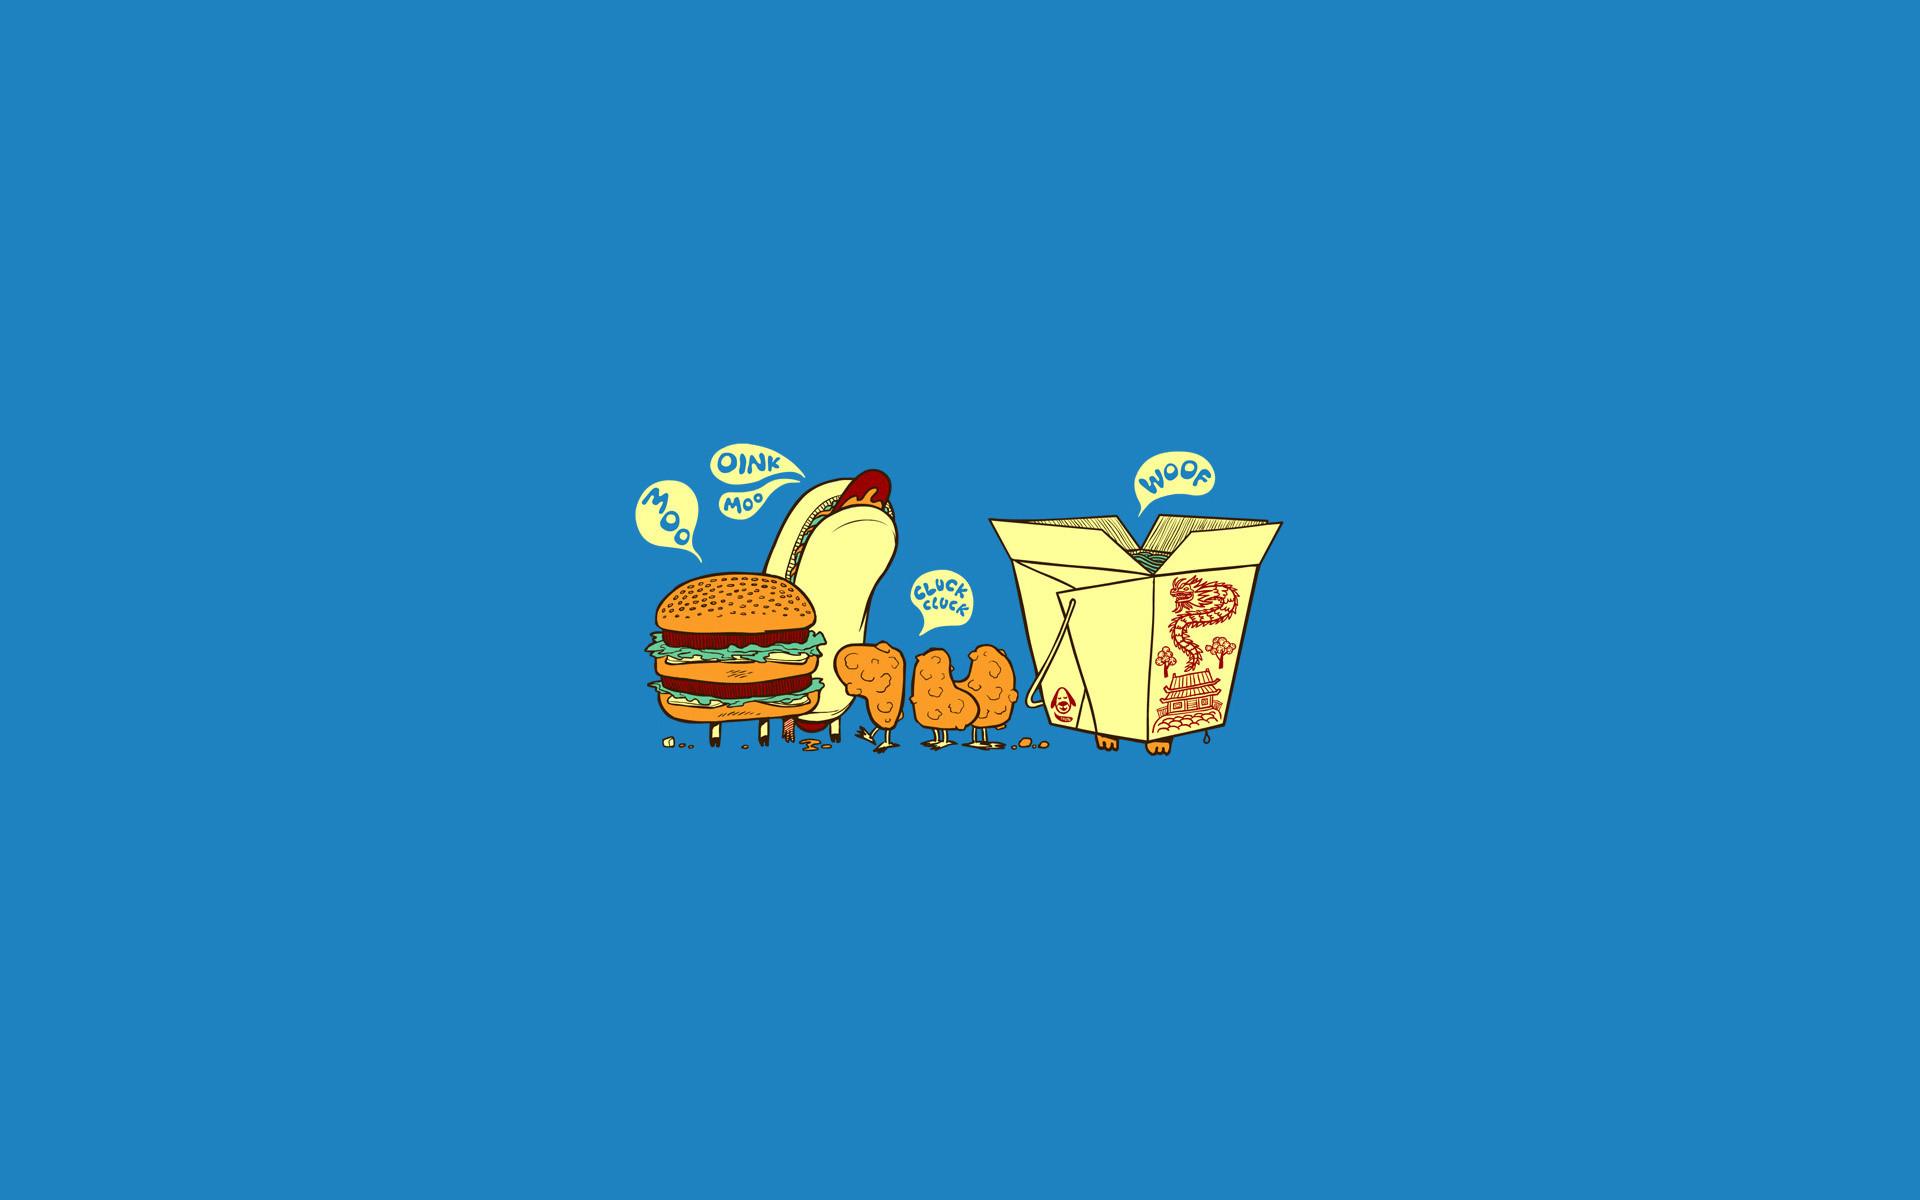 Cute Food wallpapers hd resolution